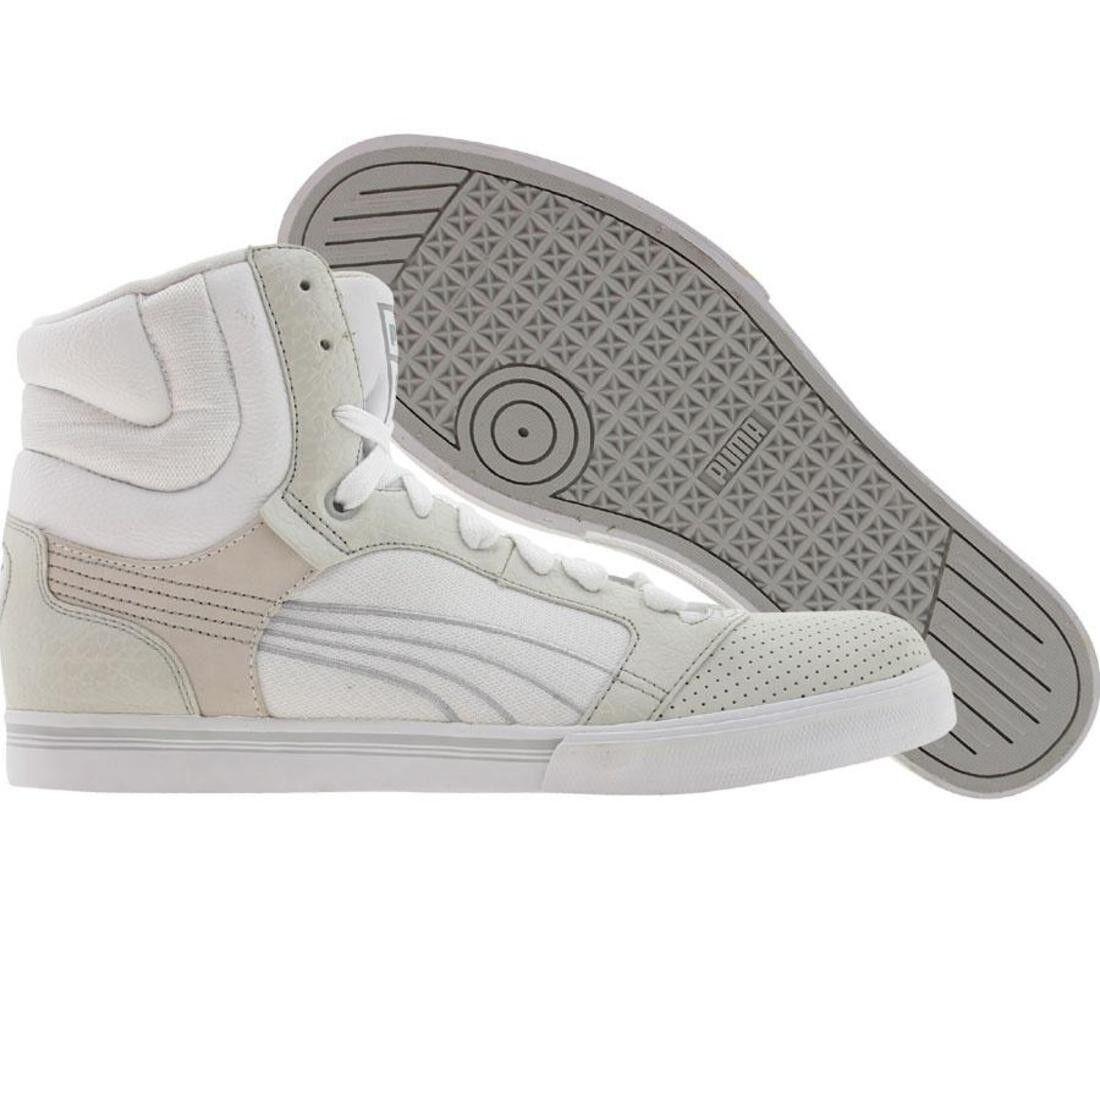 89.99 Puma Post Up High (white / grey violet) 349271-03